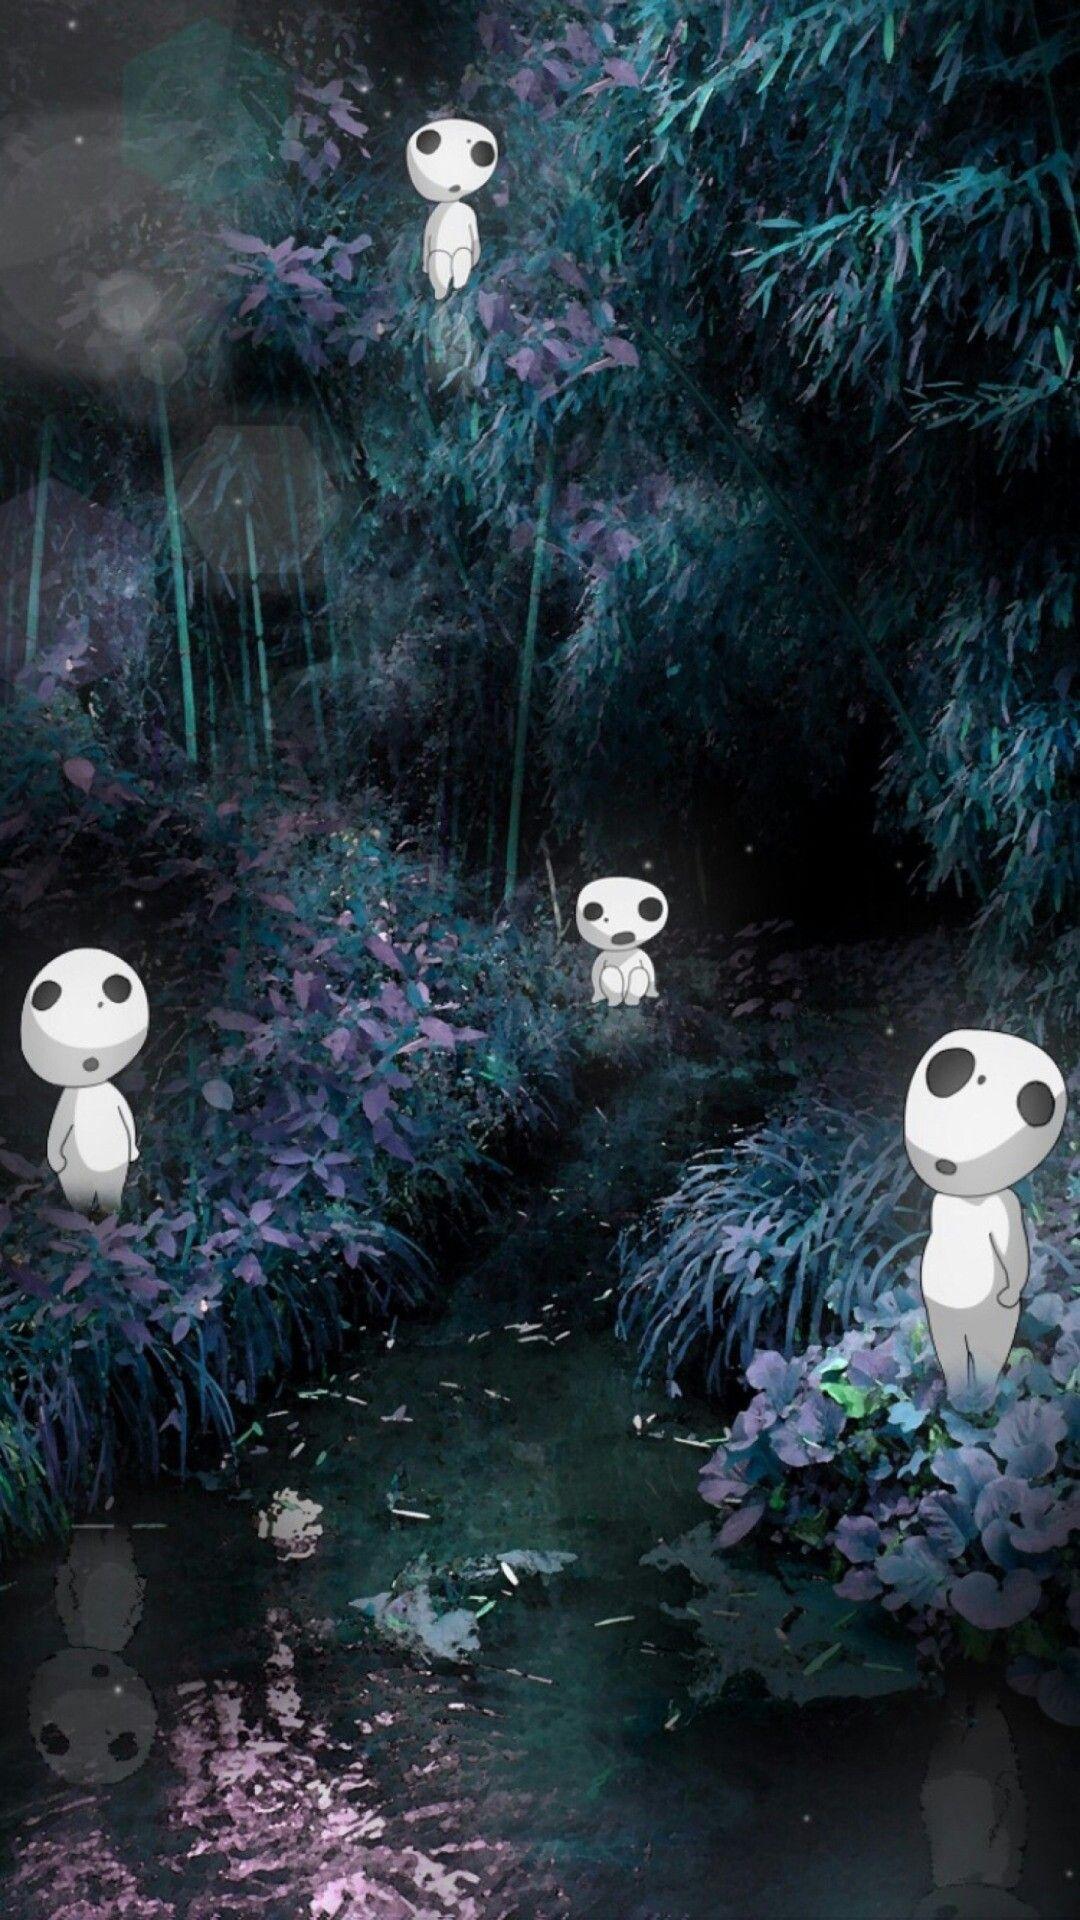 Princess Mononoke Studio Ghibli Art Ghibli Art Studio Ghibli